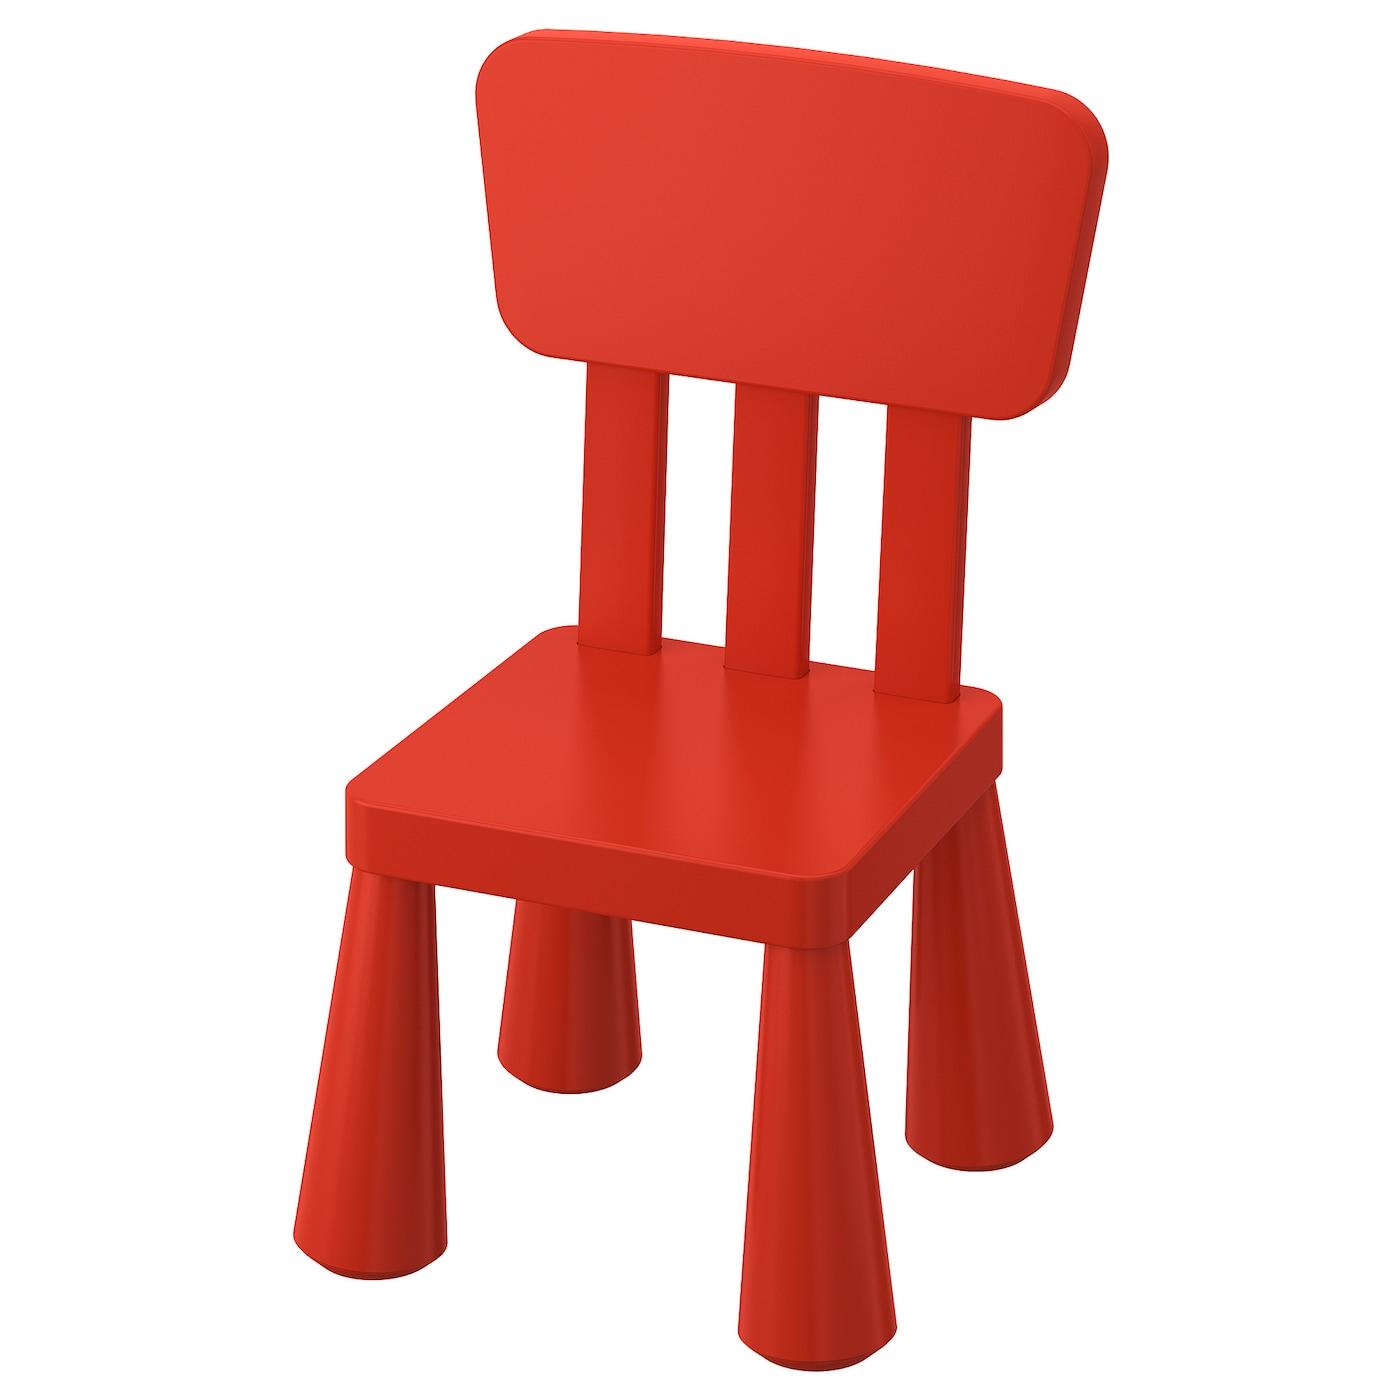 Outdoor Furniture - Buy rattan garden furniture online at